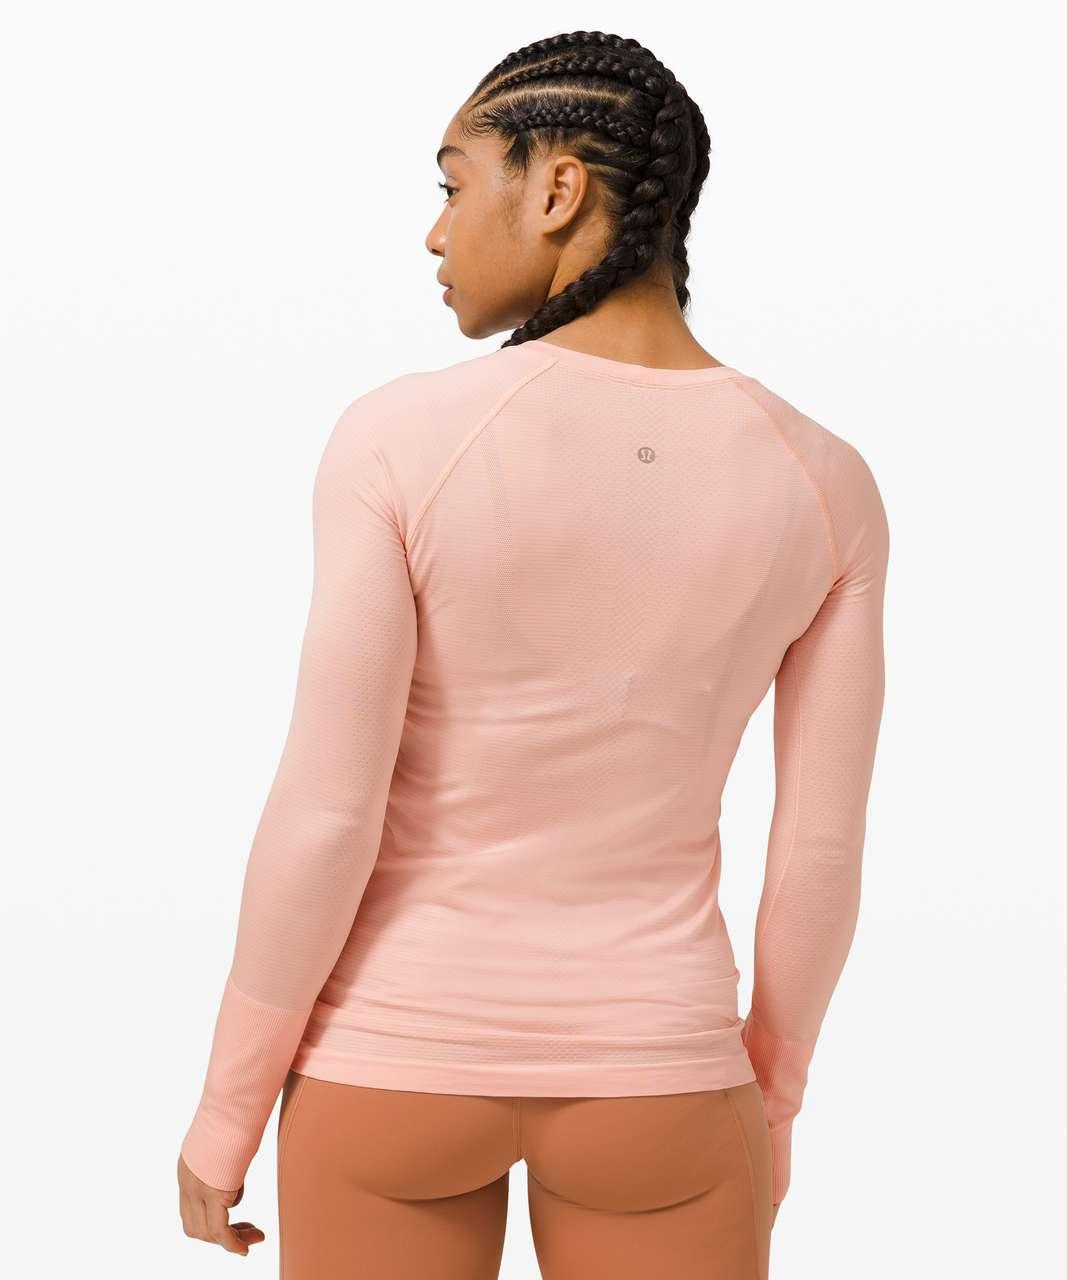 Lululemon Swiftly Tech Long Sleeve 2.0 - Pink Mist / Pink Mist